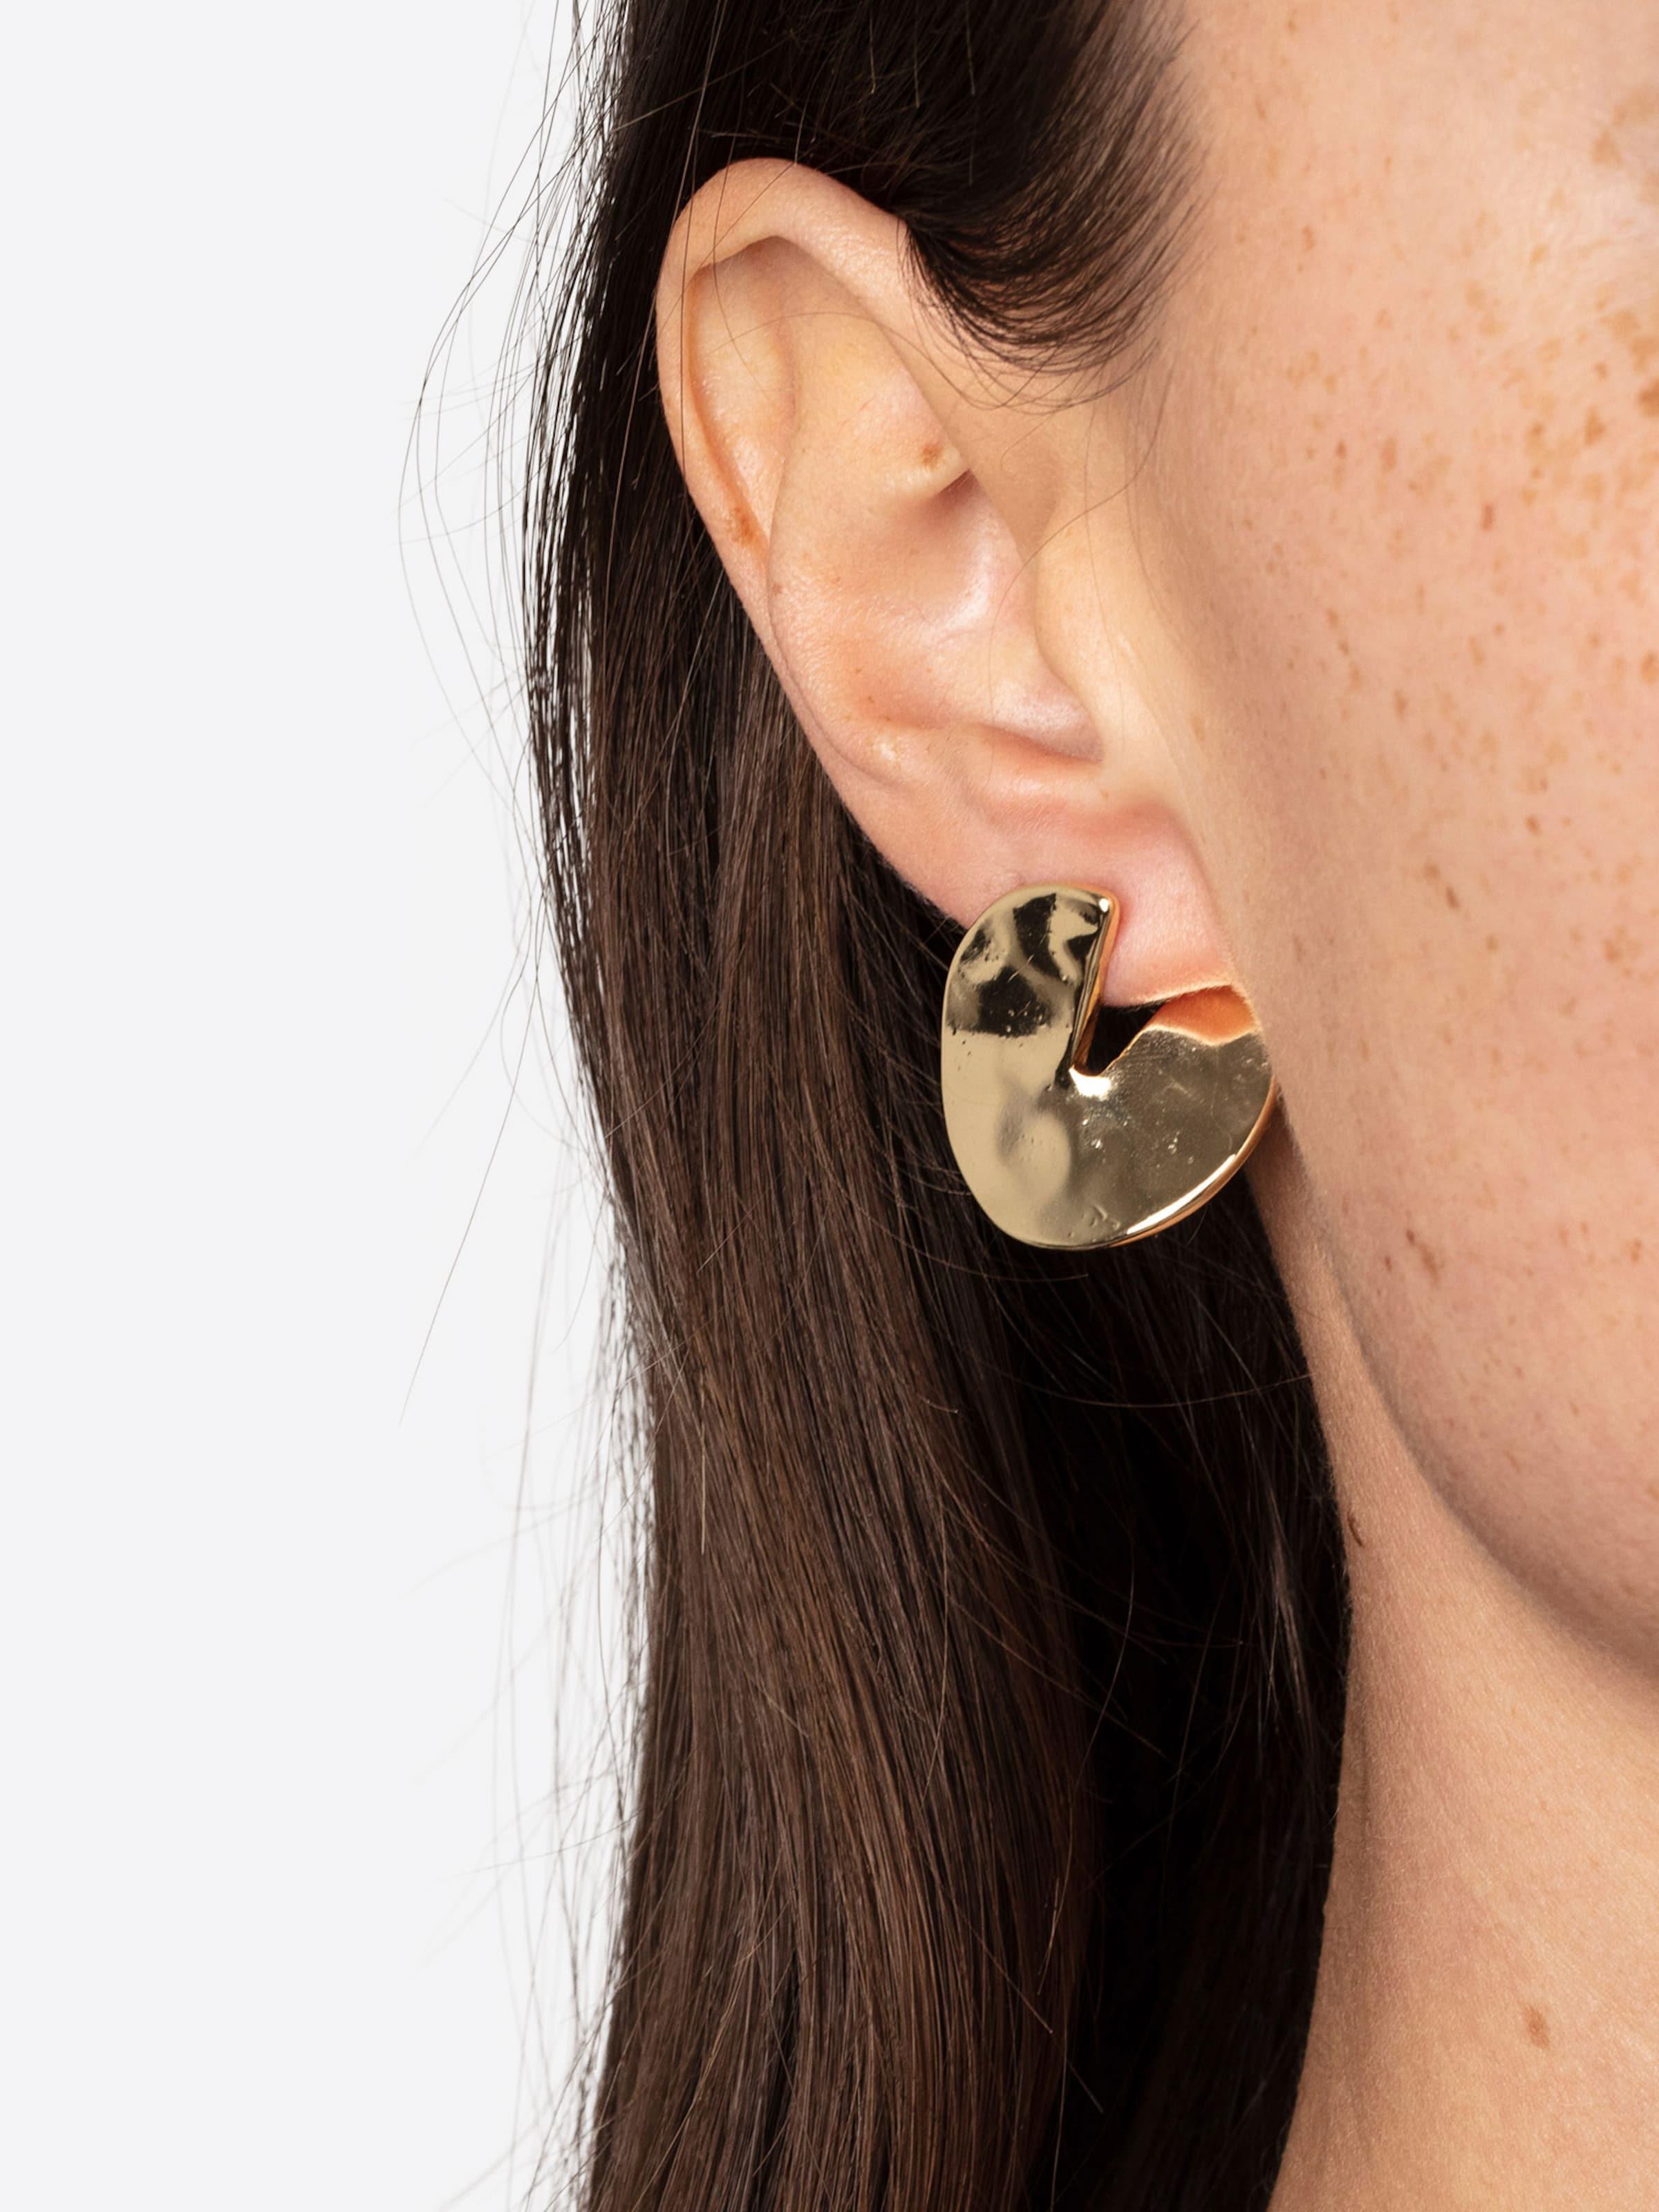 D'oreilles En Pilgrim Boucles 'earringsCynthia' Argent JTFu3lK1c